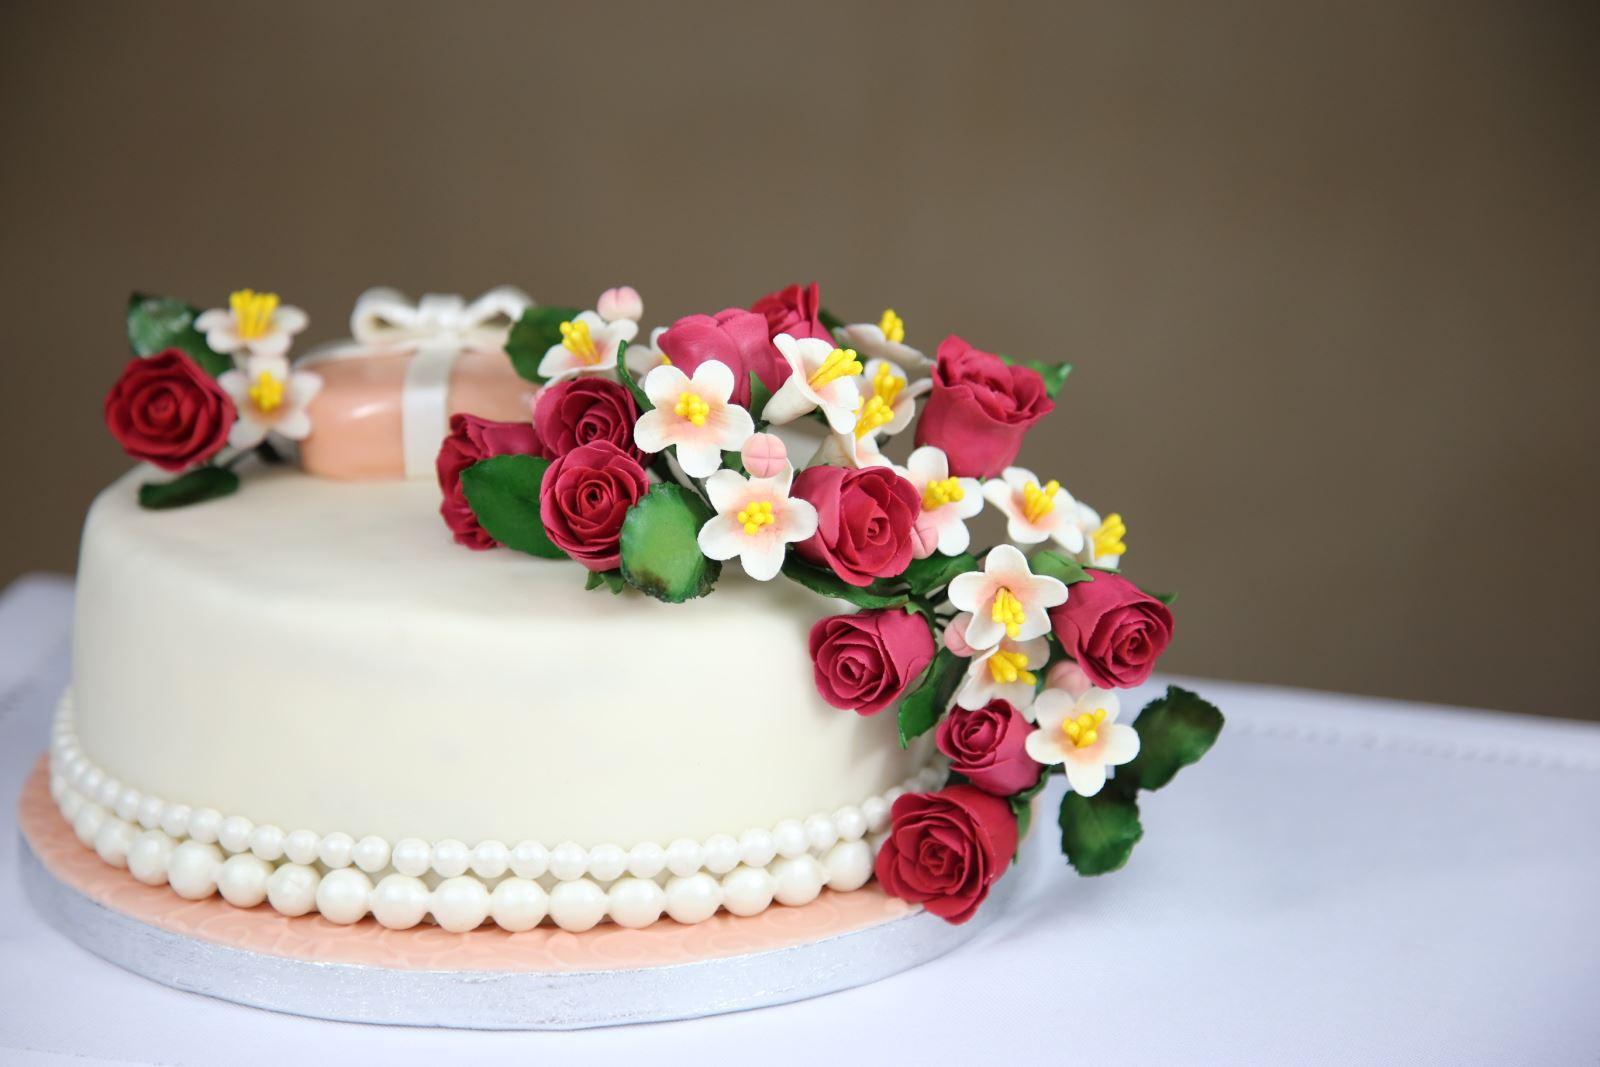 Pretty decorated cupcakes